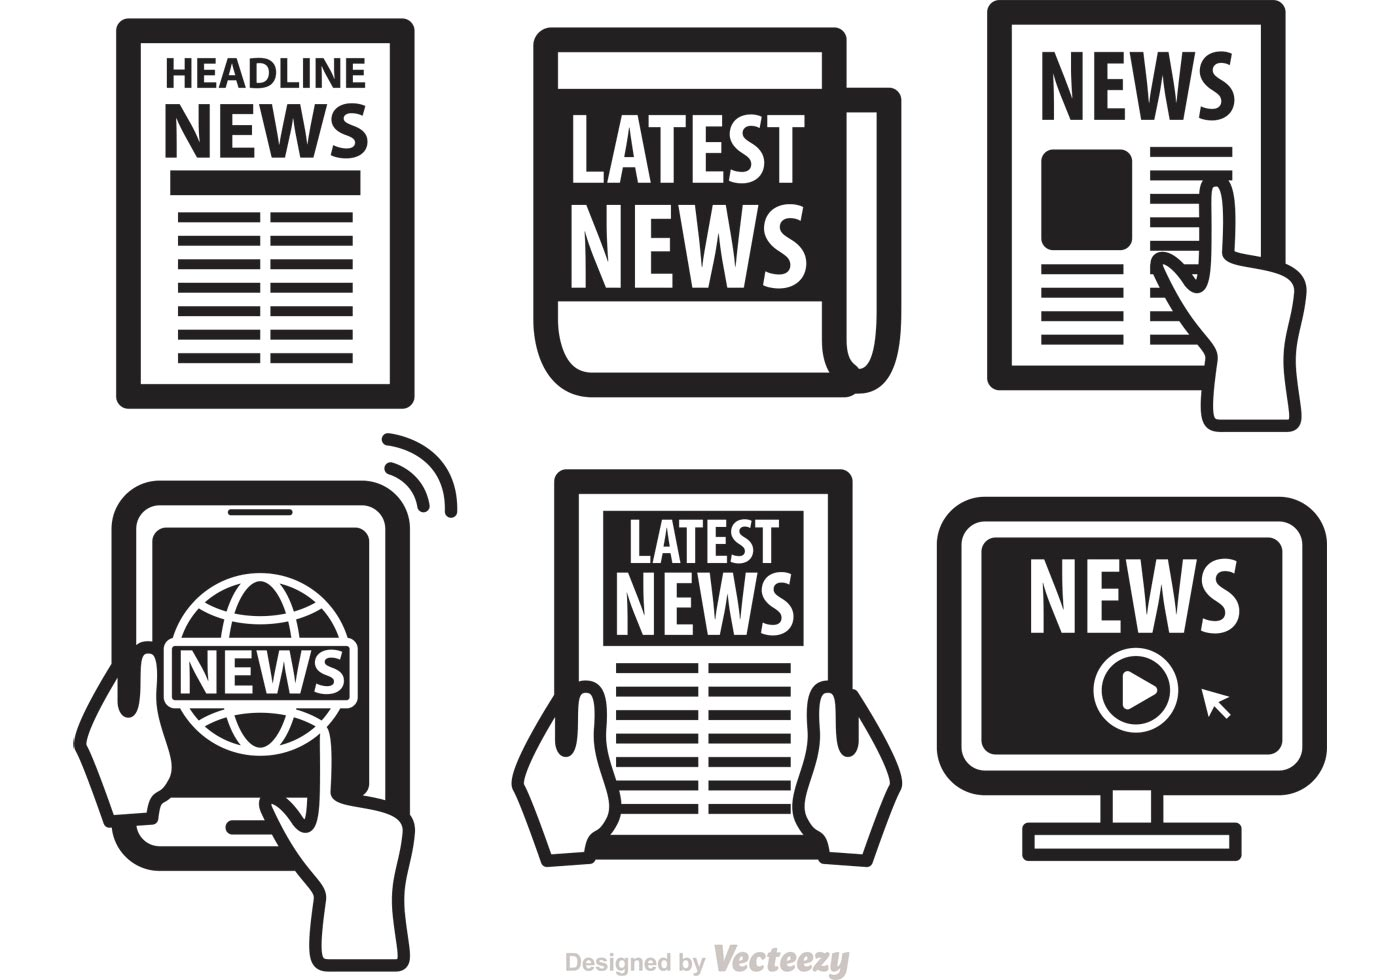 newspaper media icons vectors - download free vector art, stock